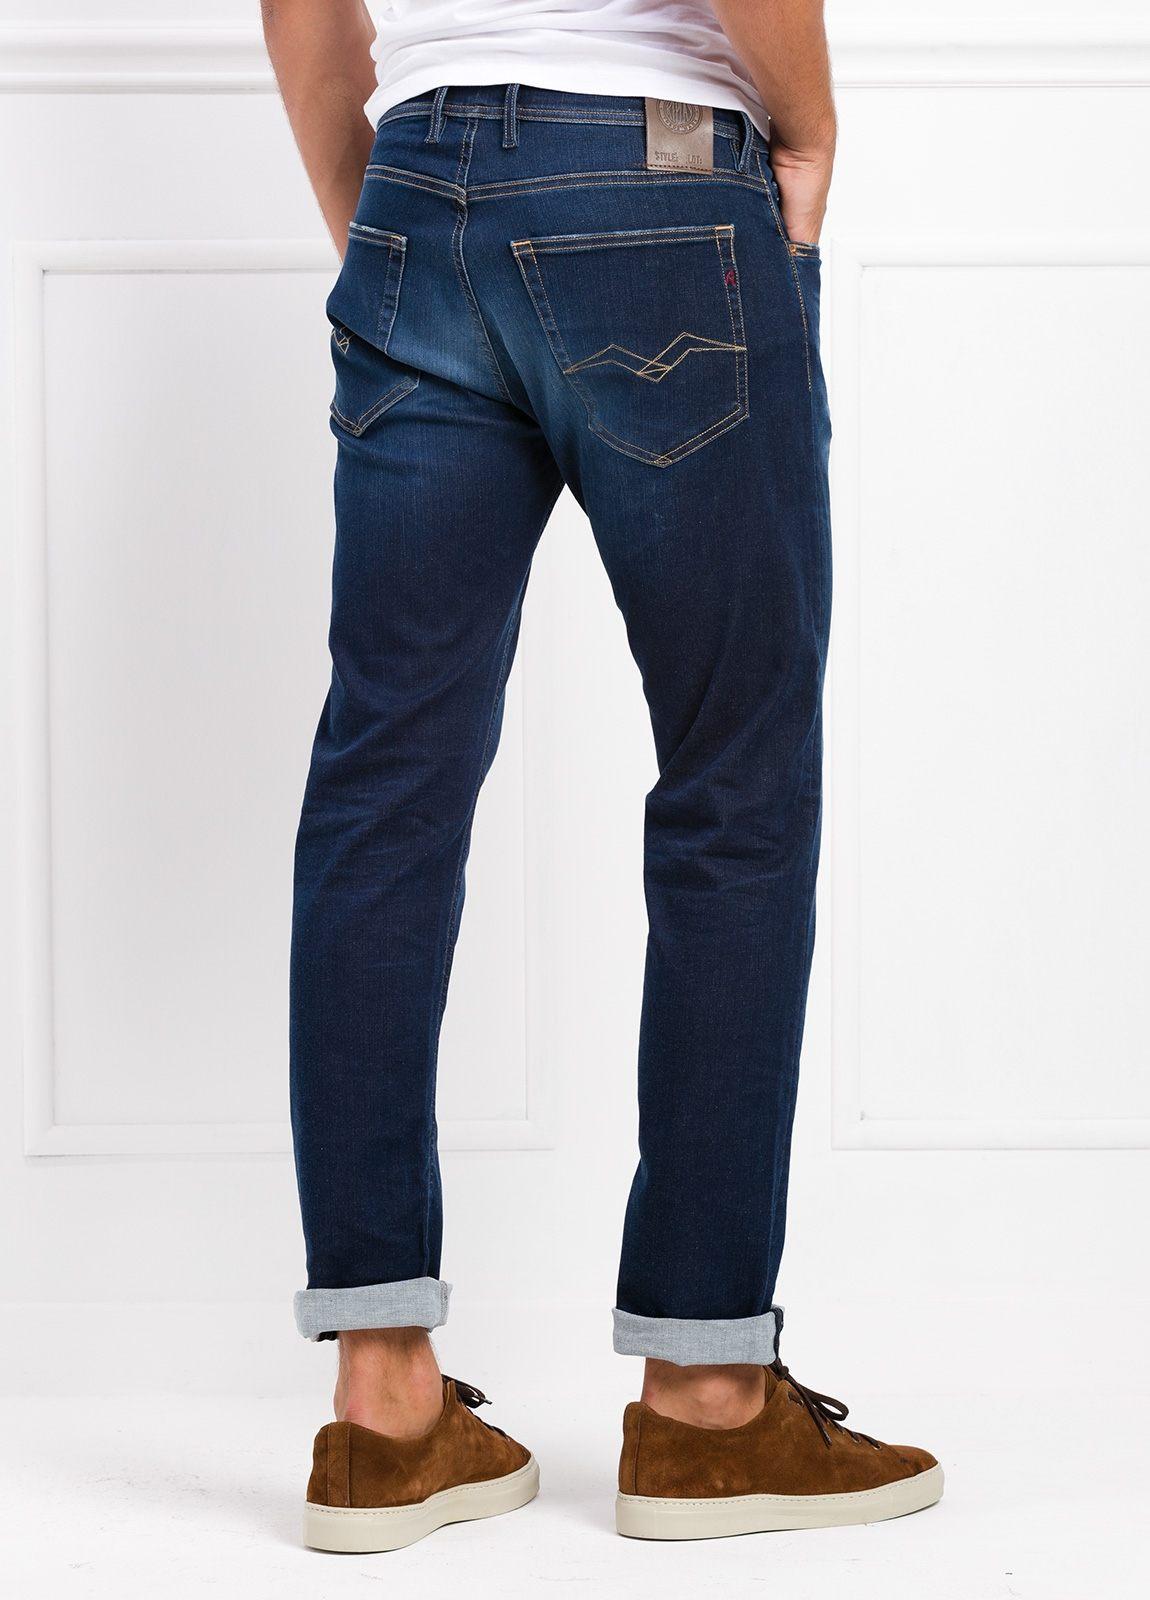 Pantalón tejano corte recto MA972 GROVER color azul lavado. Algodón - Ítem2